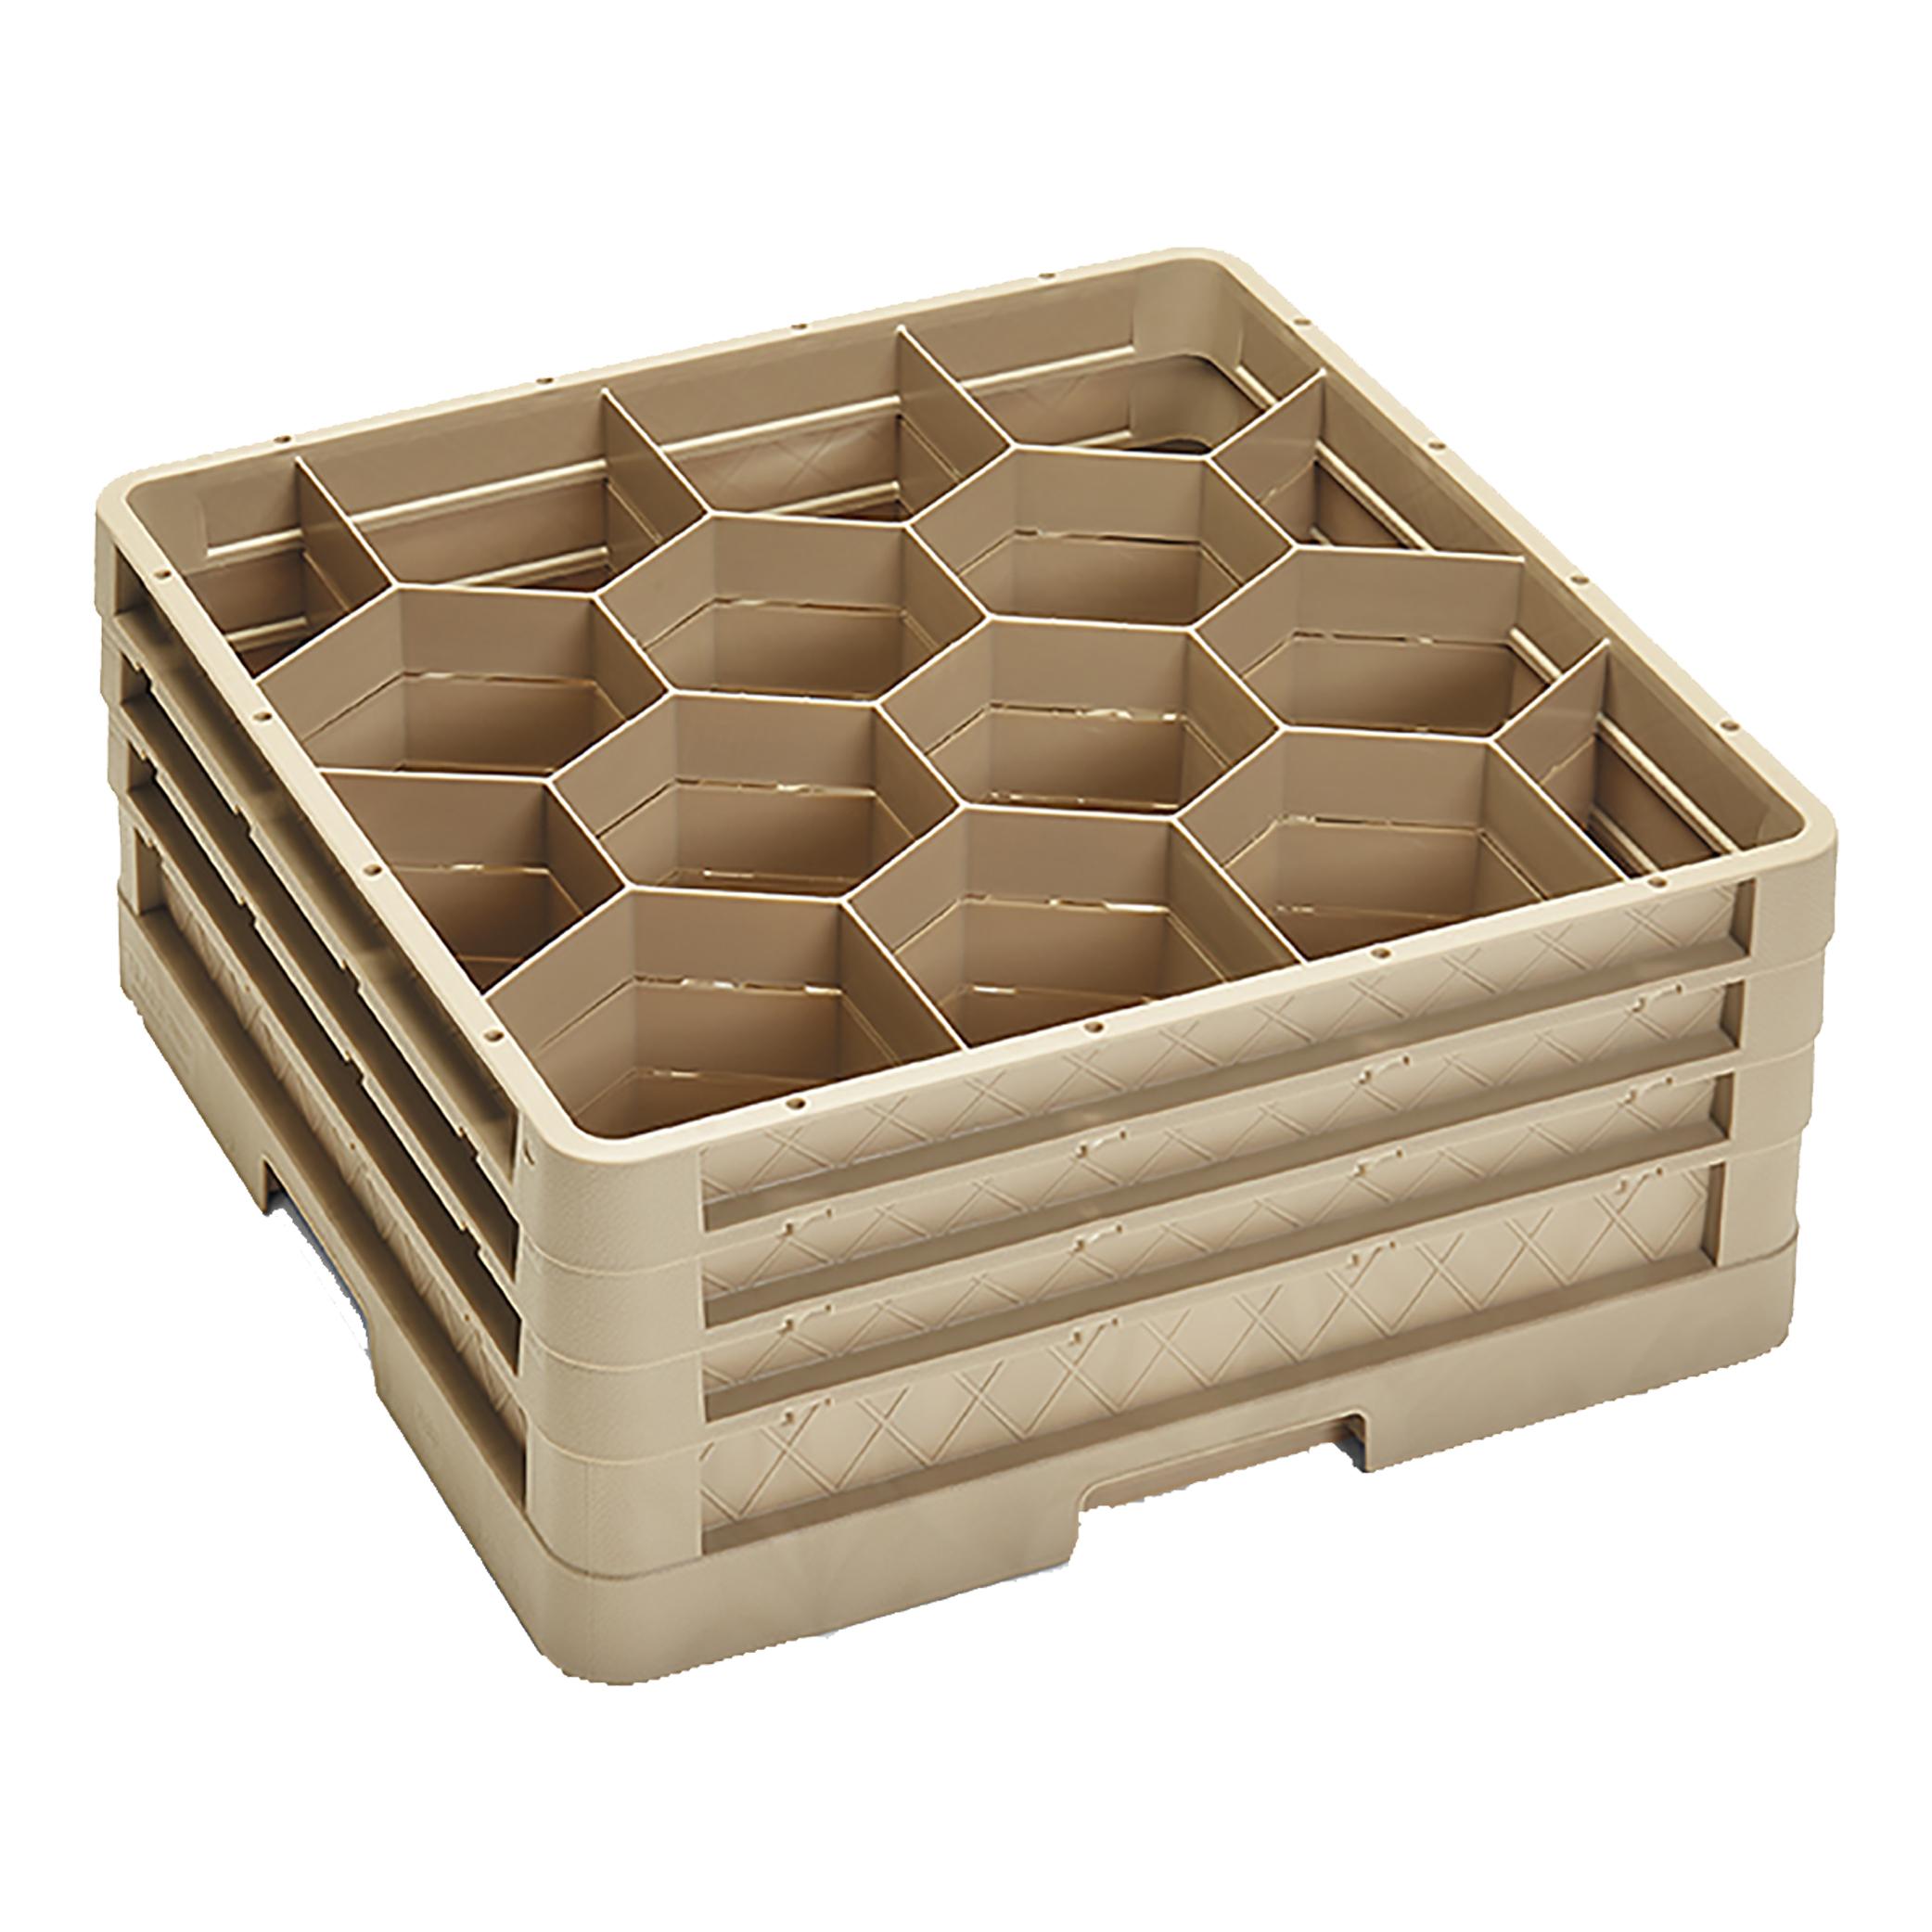 Vollrath CR18JJJ dishwasher rack, glass compartment